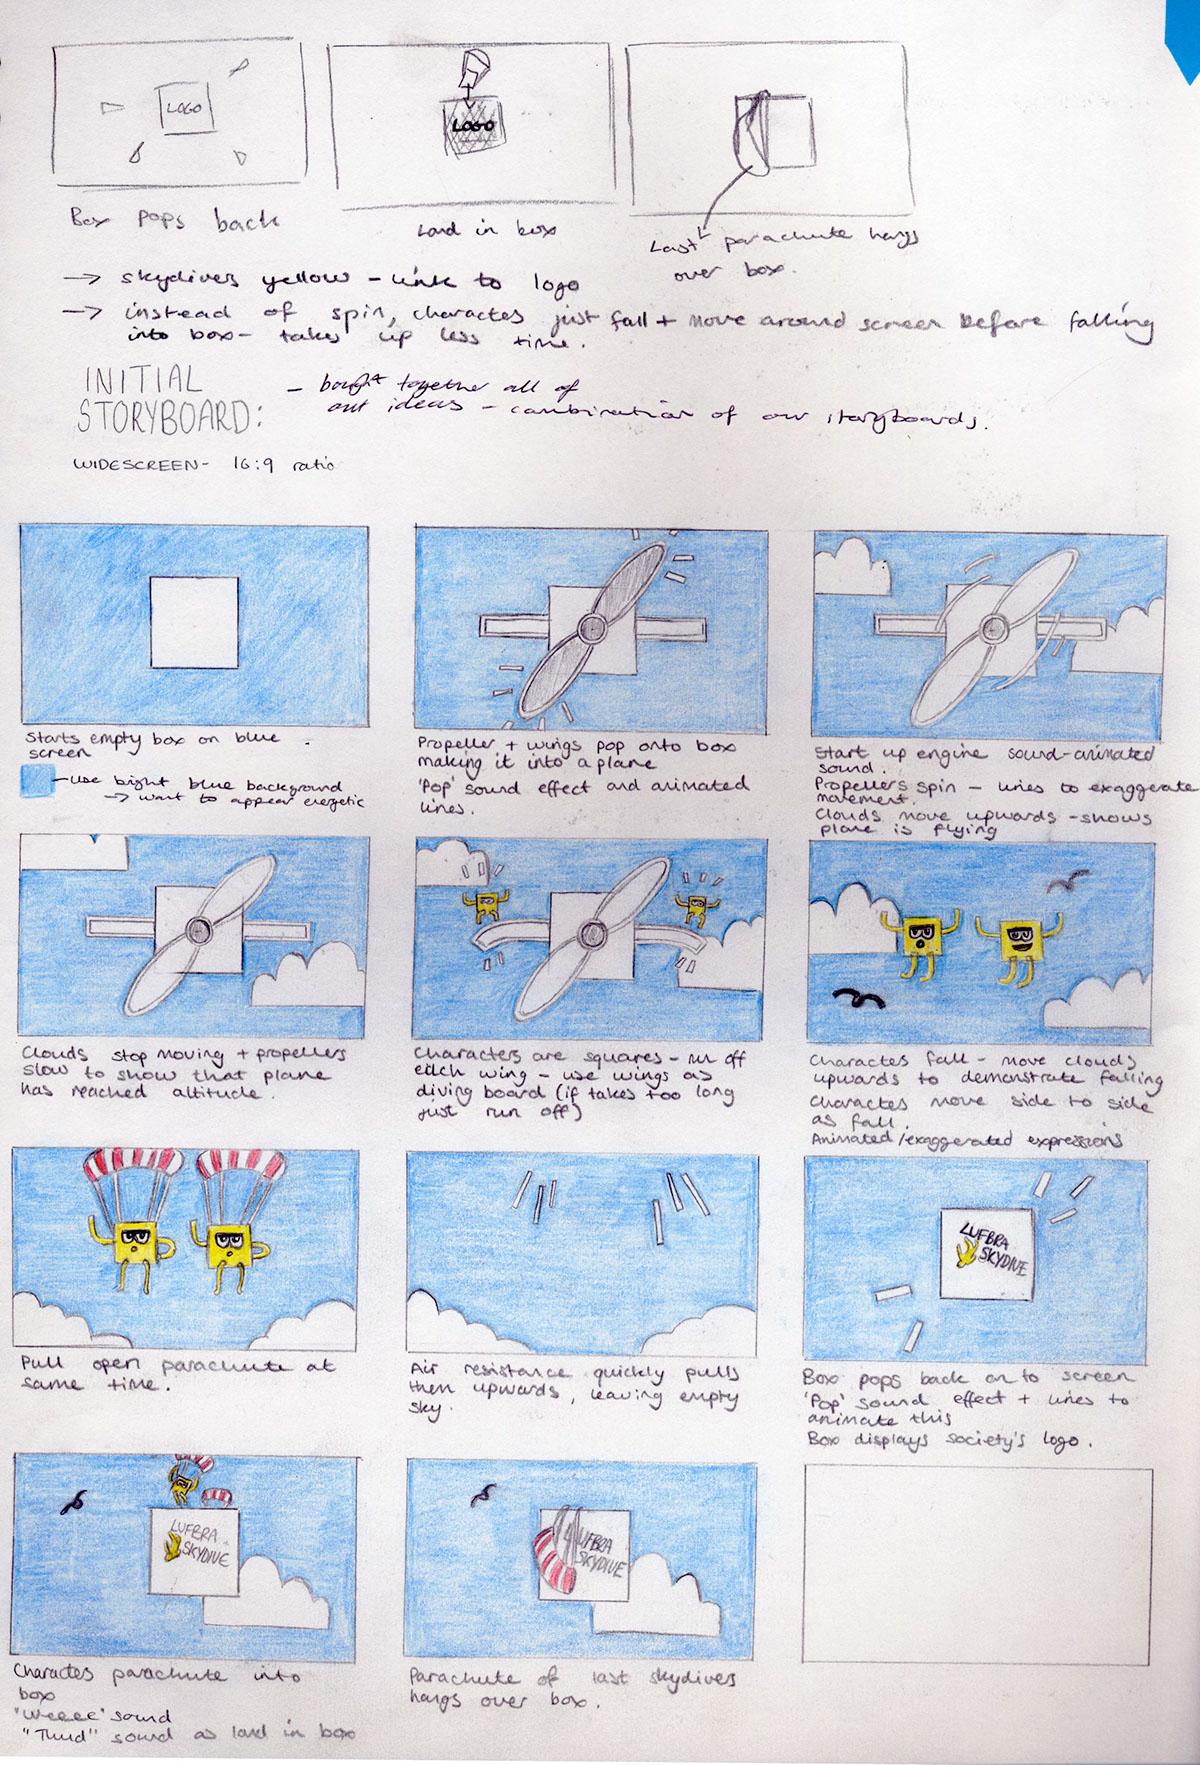 LSU Skydive Animation on Behance